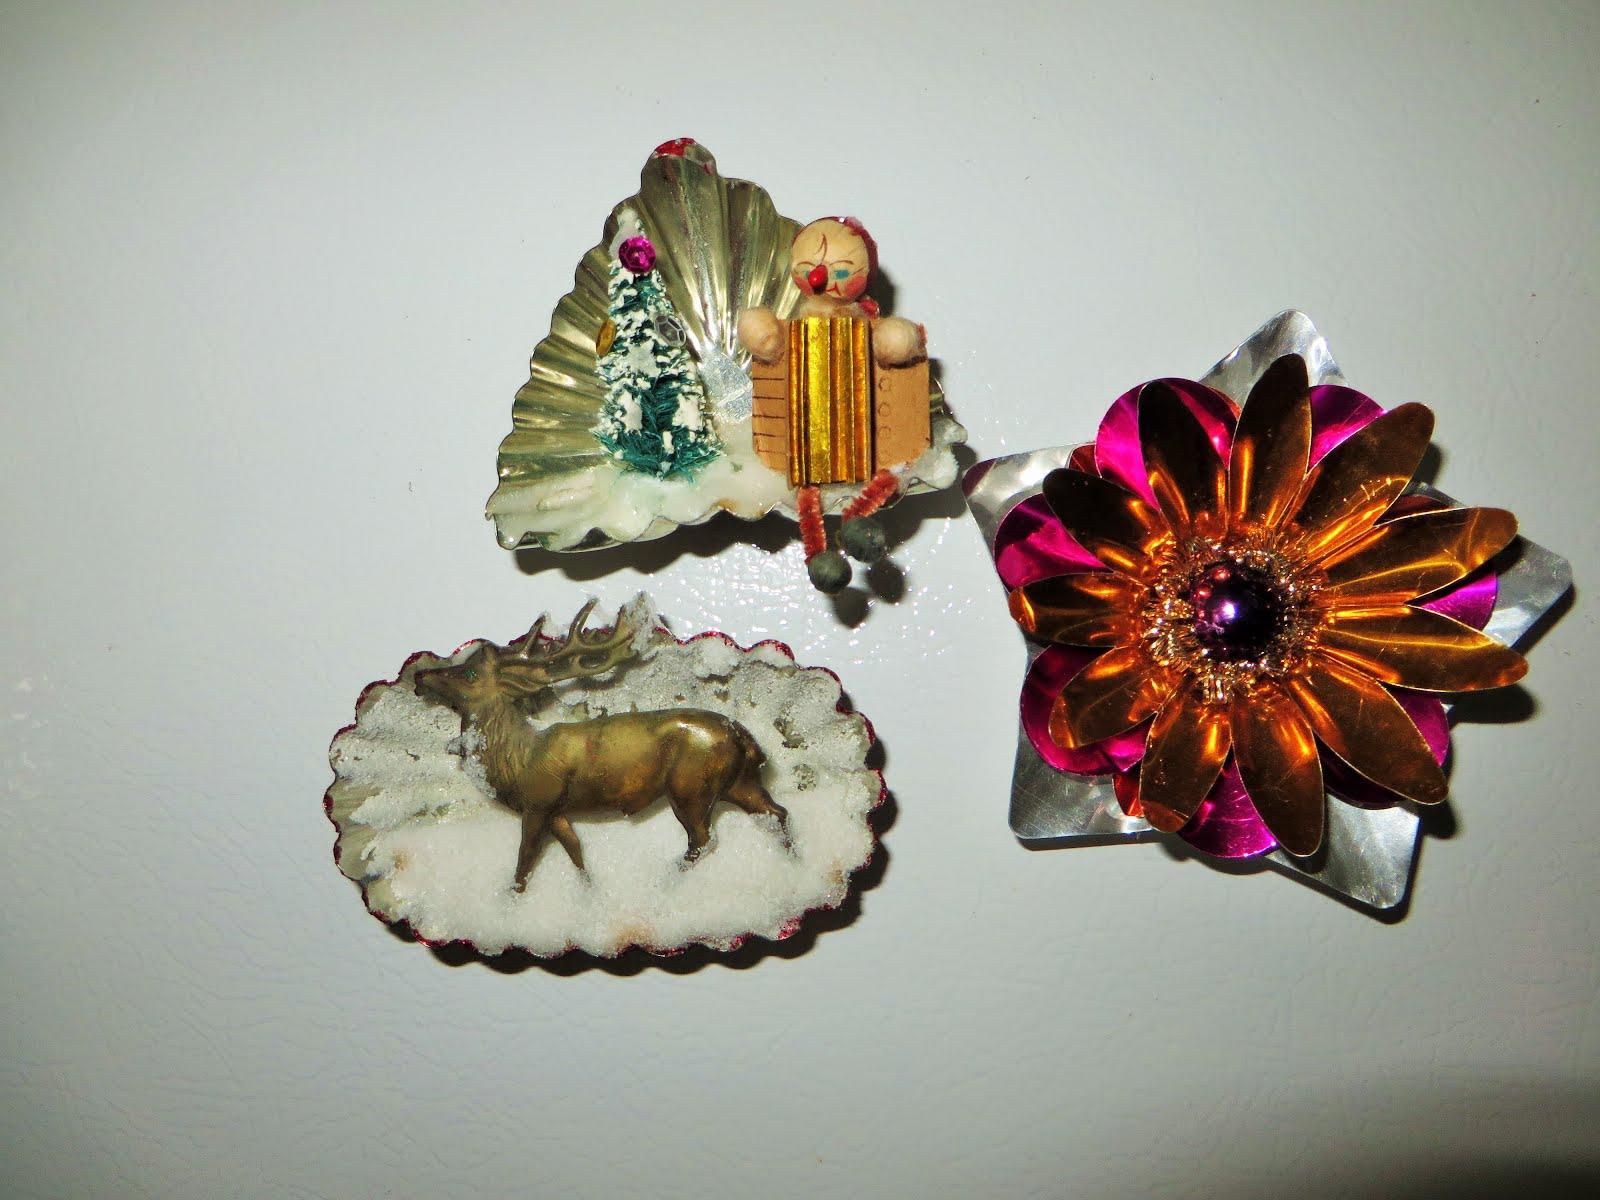 set of Christmas magnets